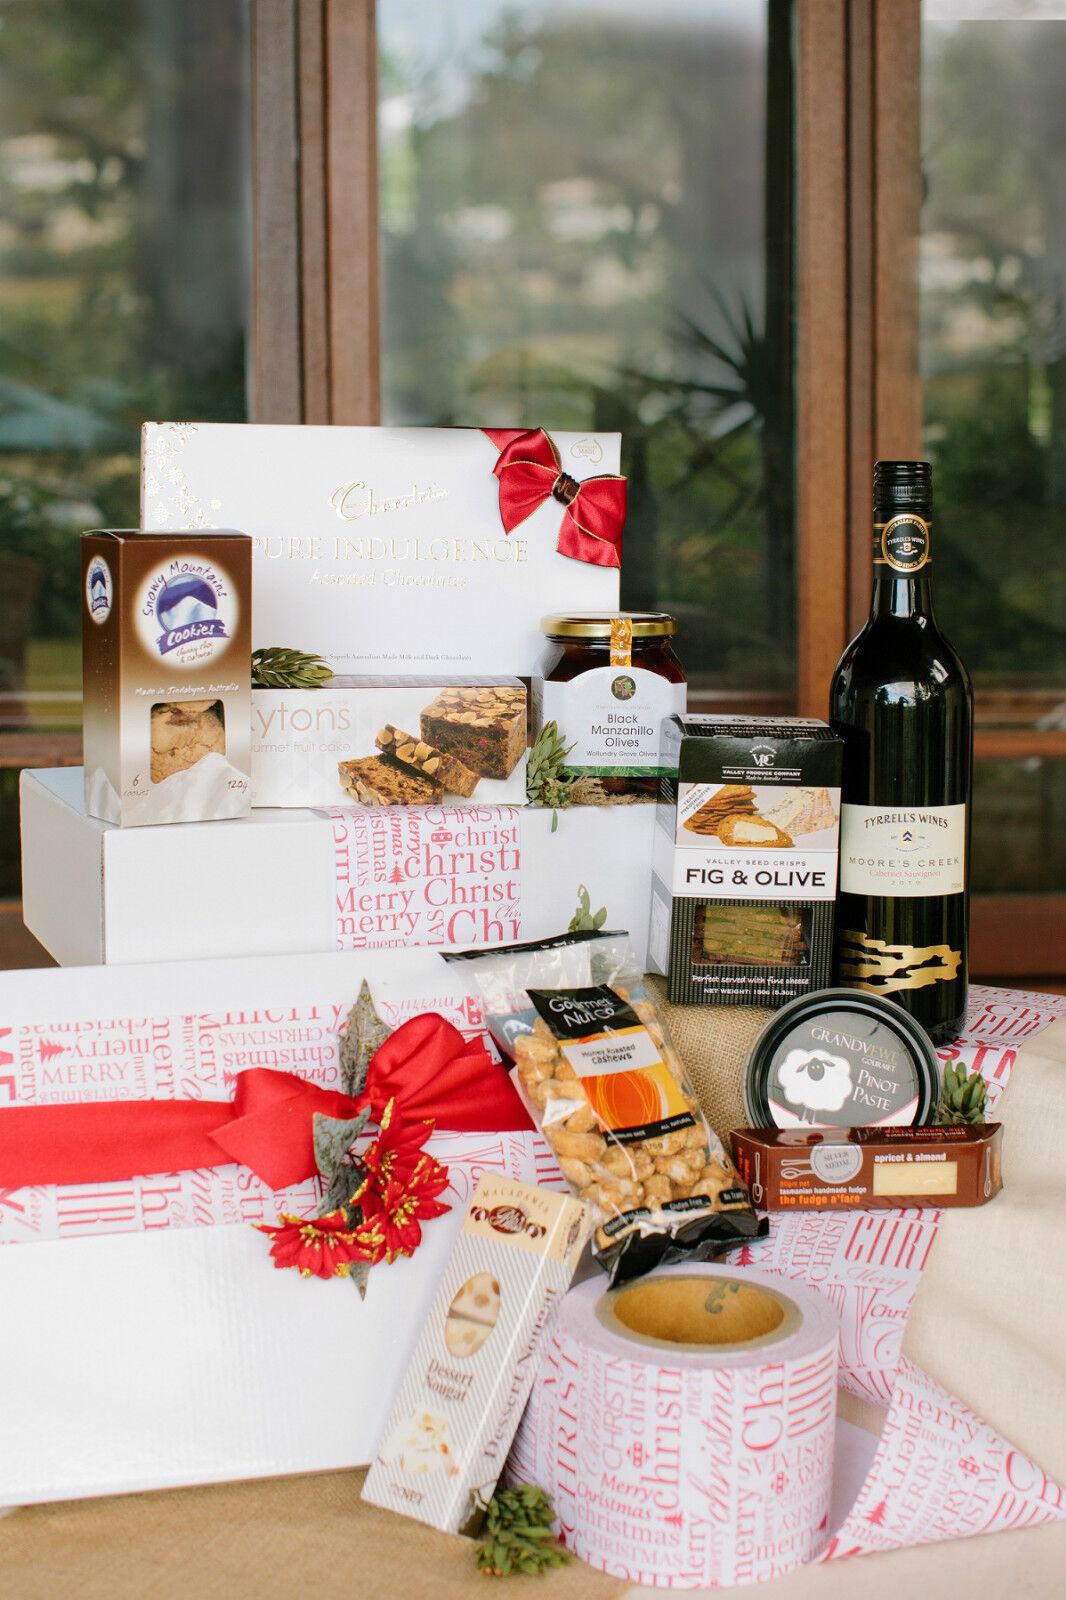 Christmas Cheer Gift hamper Basket - OZ WIDE Delivery -  25 WE ALSO SEND OS